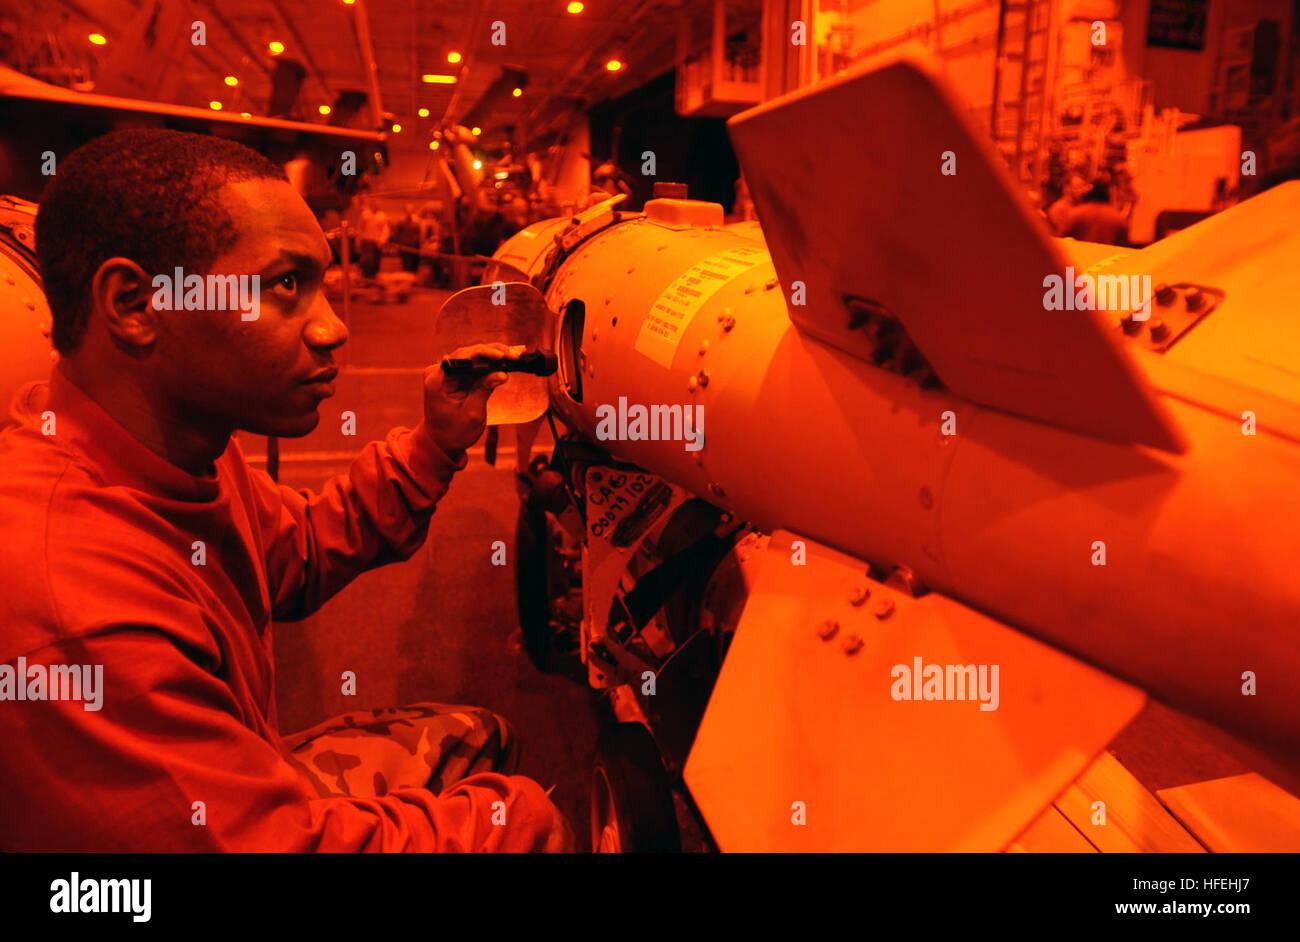 030327-N-7781D-032  The Mediterranean Sea (Mar. 27, 2003) Ð Aviation Ordnanceman complete checks of ordnance - Stock Image